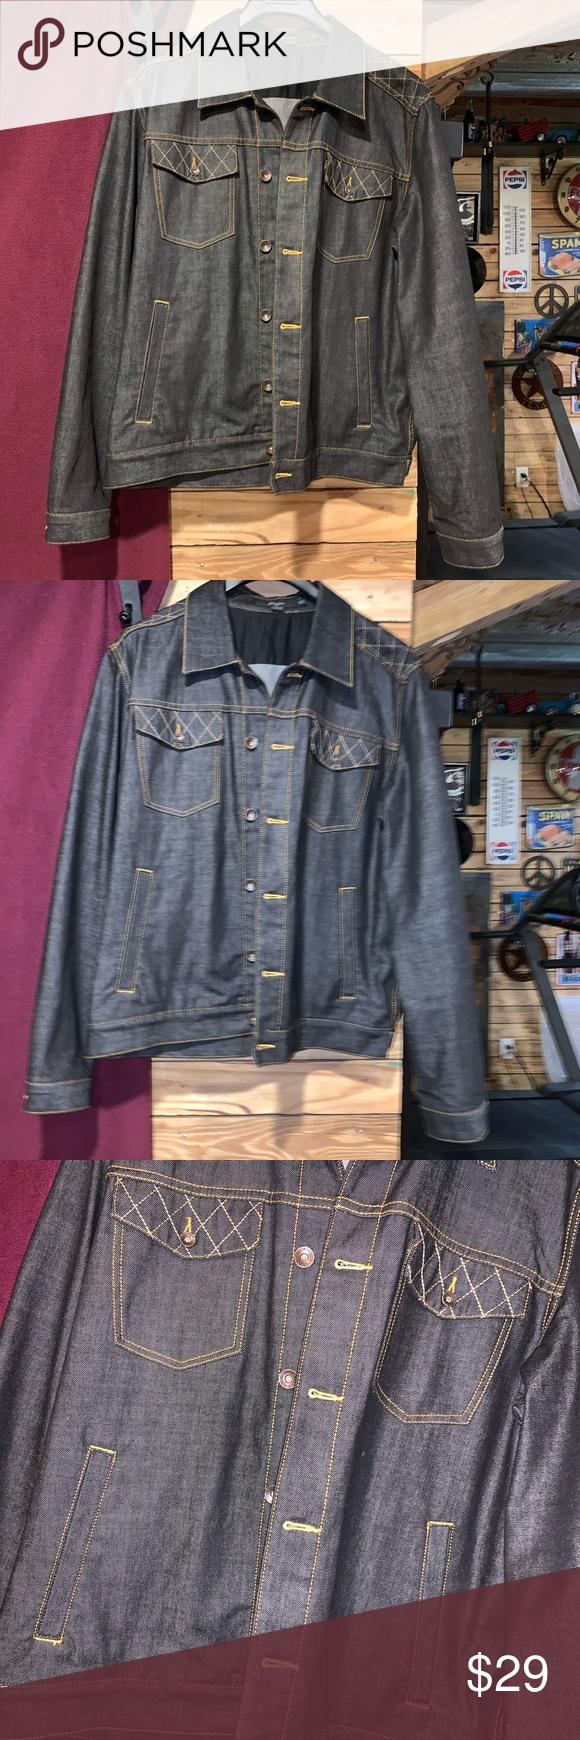 Sean John Denim Jean Jacket Size Xxl Denim Jean Jacket Jean Jacket Denim Jeans [ 1740 x 580 Pixel ]